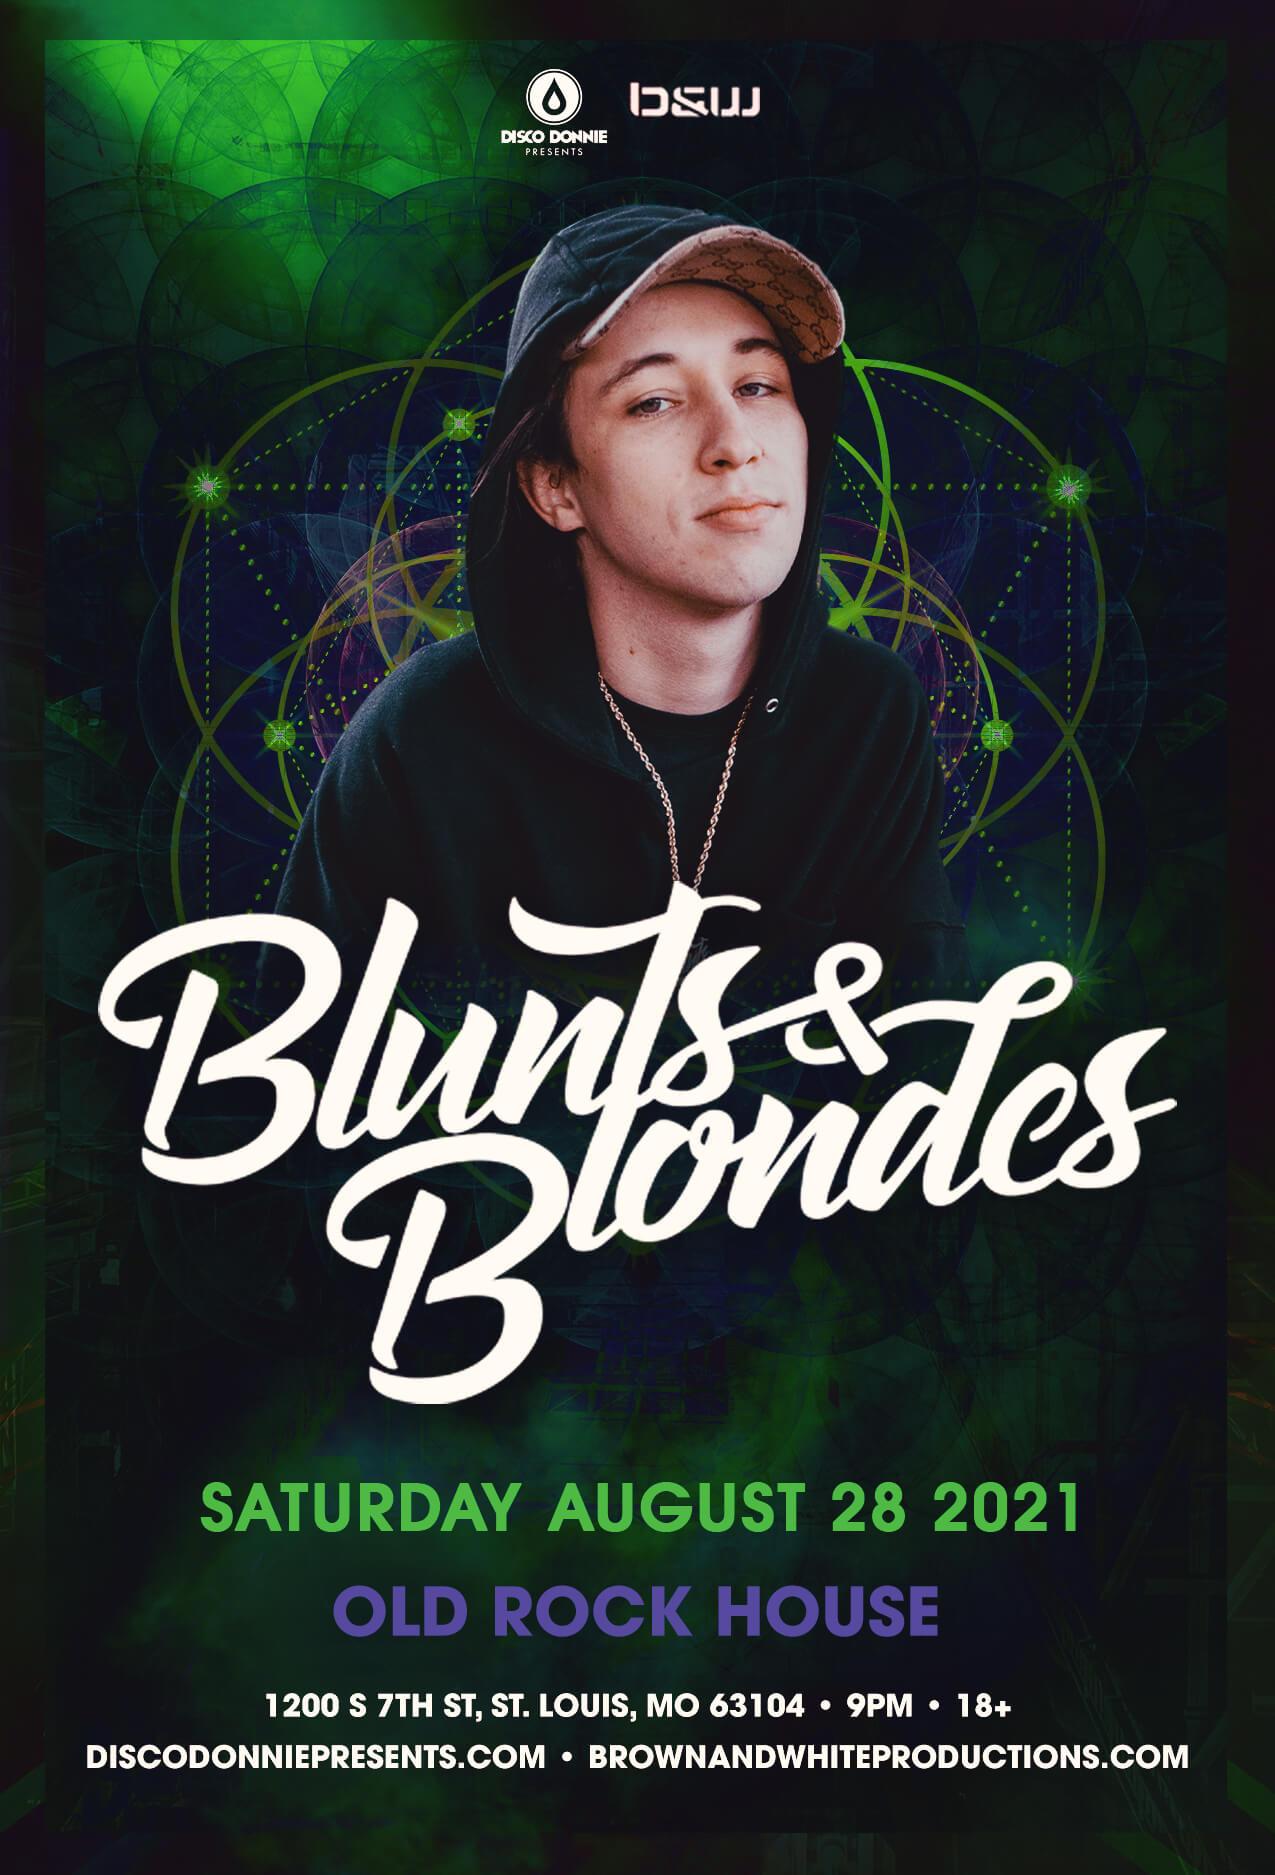 Blunts & Blondes in St Louis